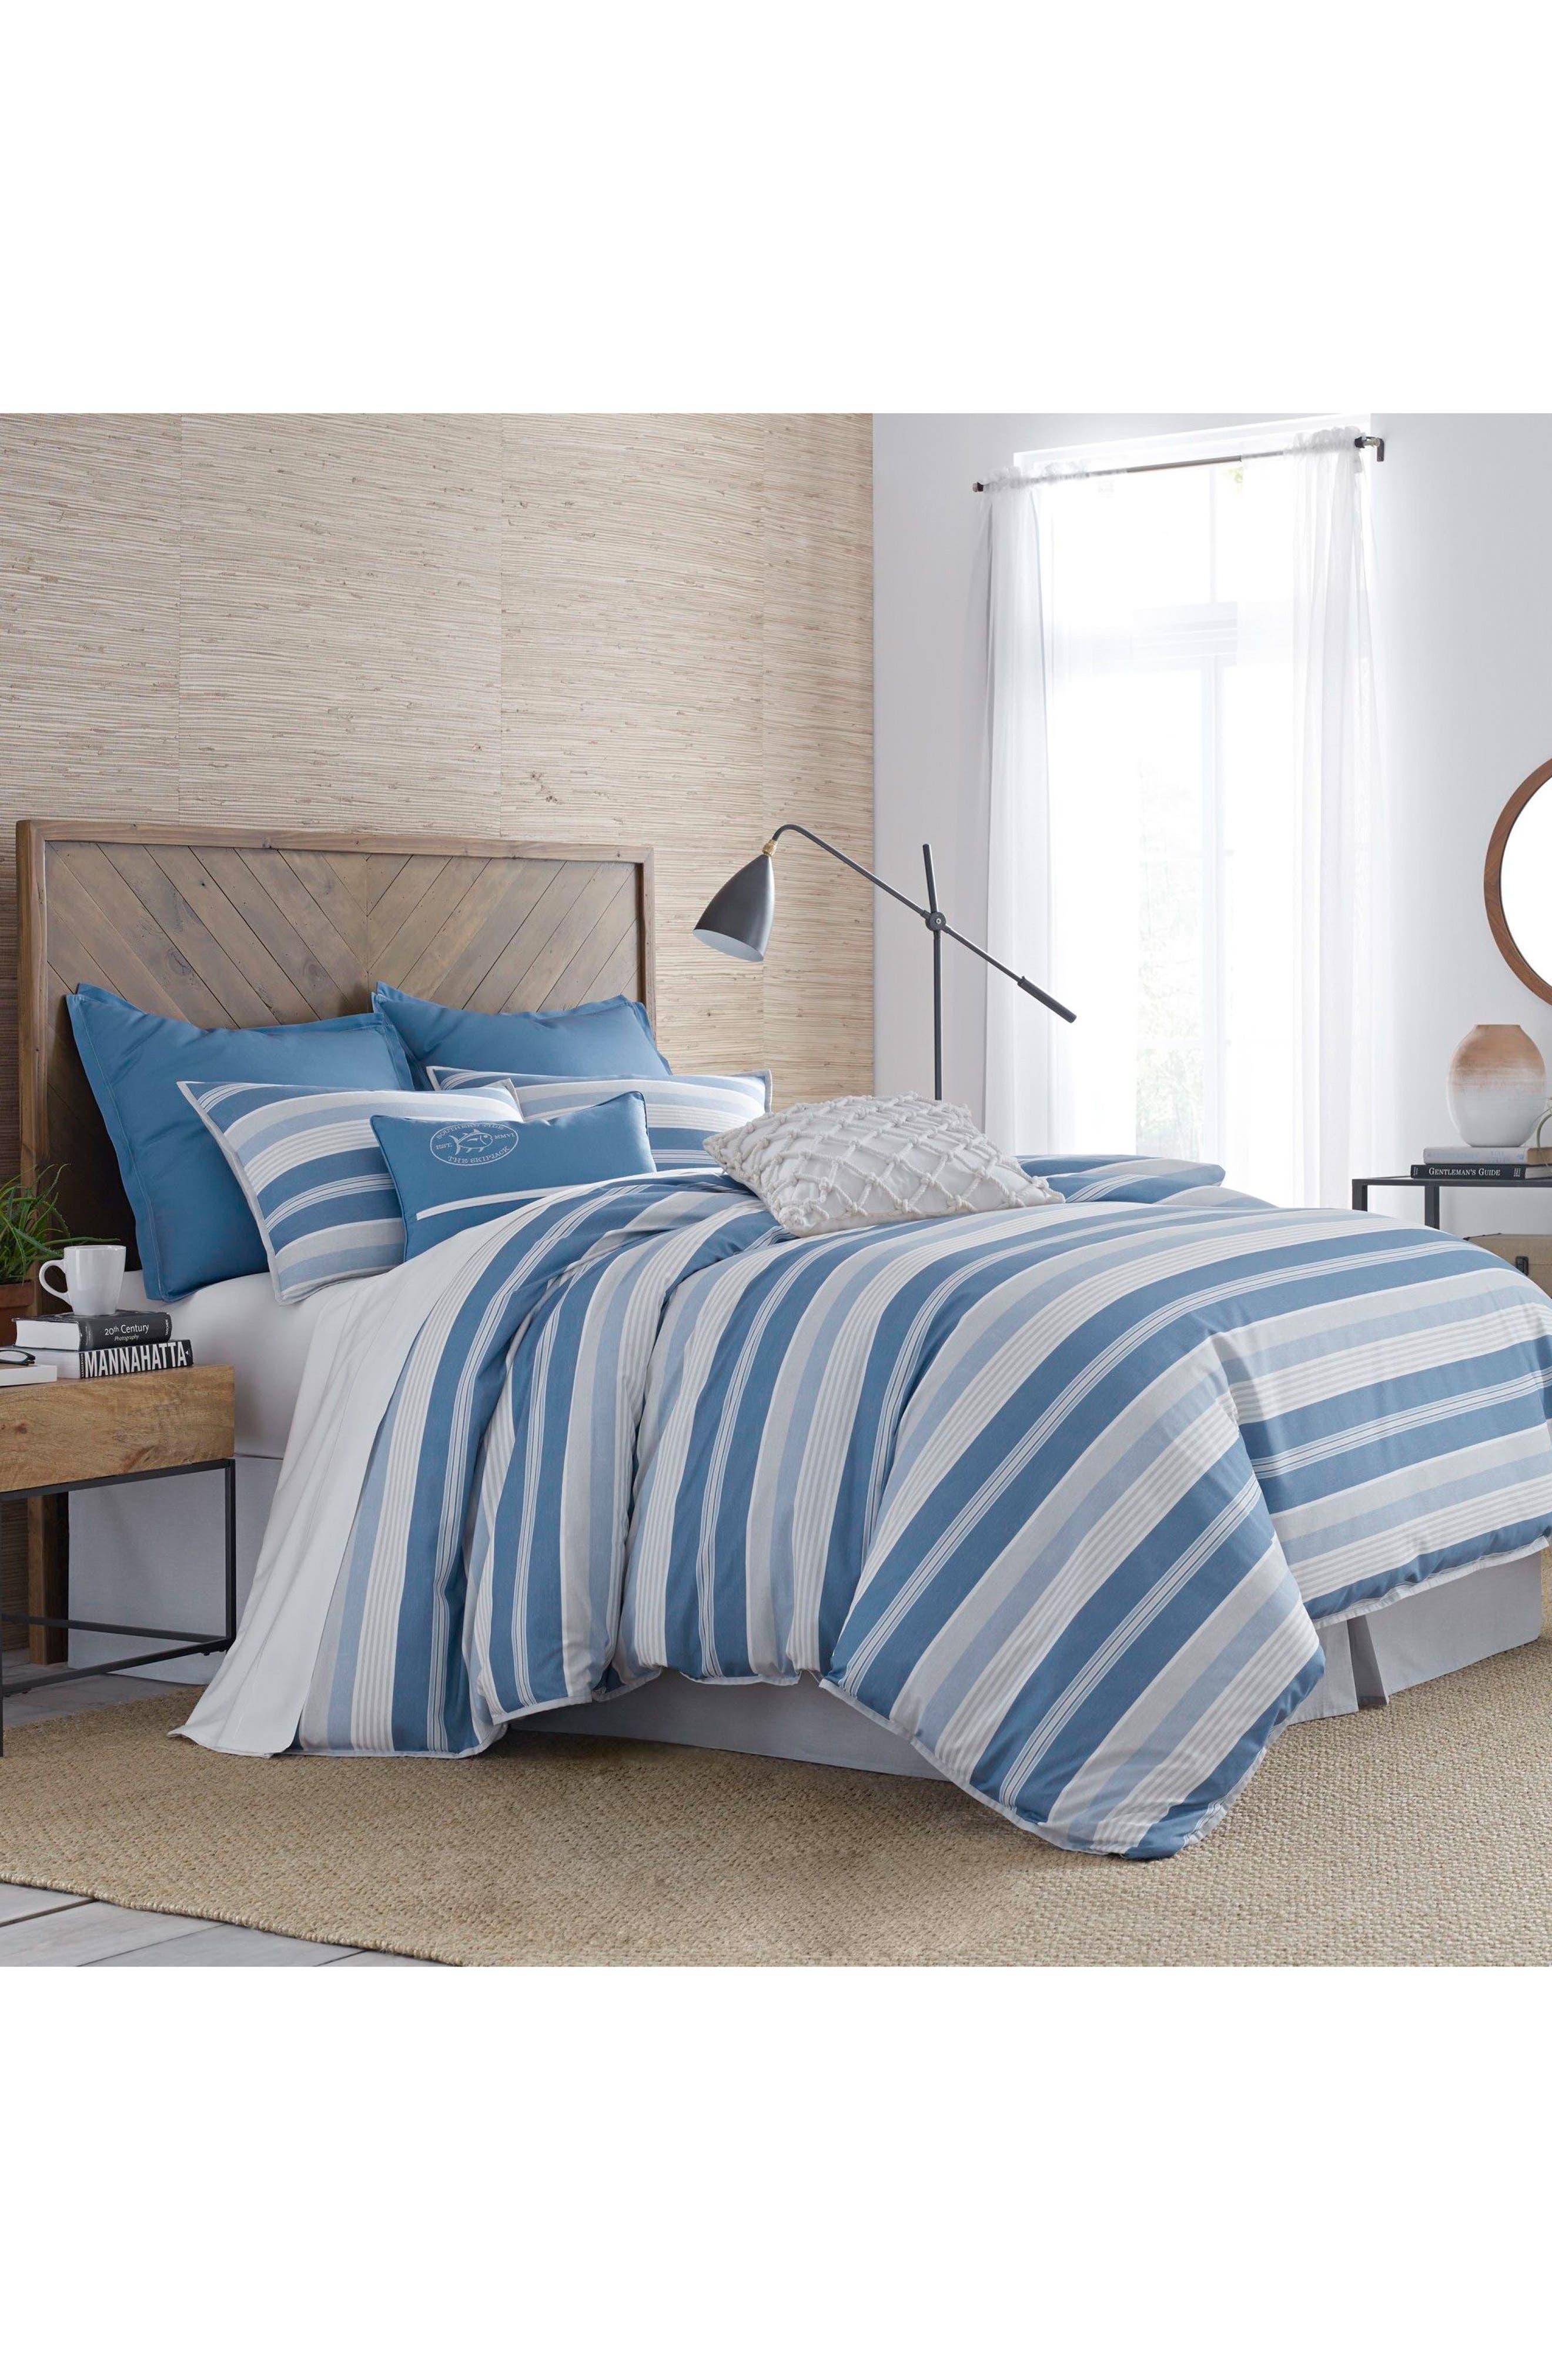 Southern Tide Skipper Stripe Comforter & Sham Set